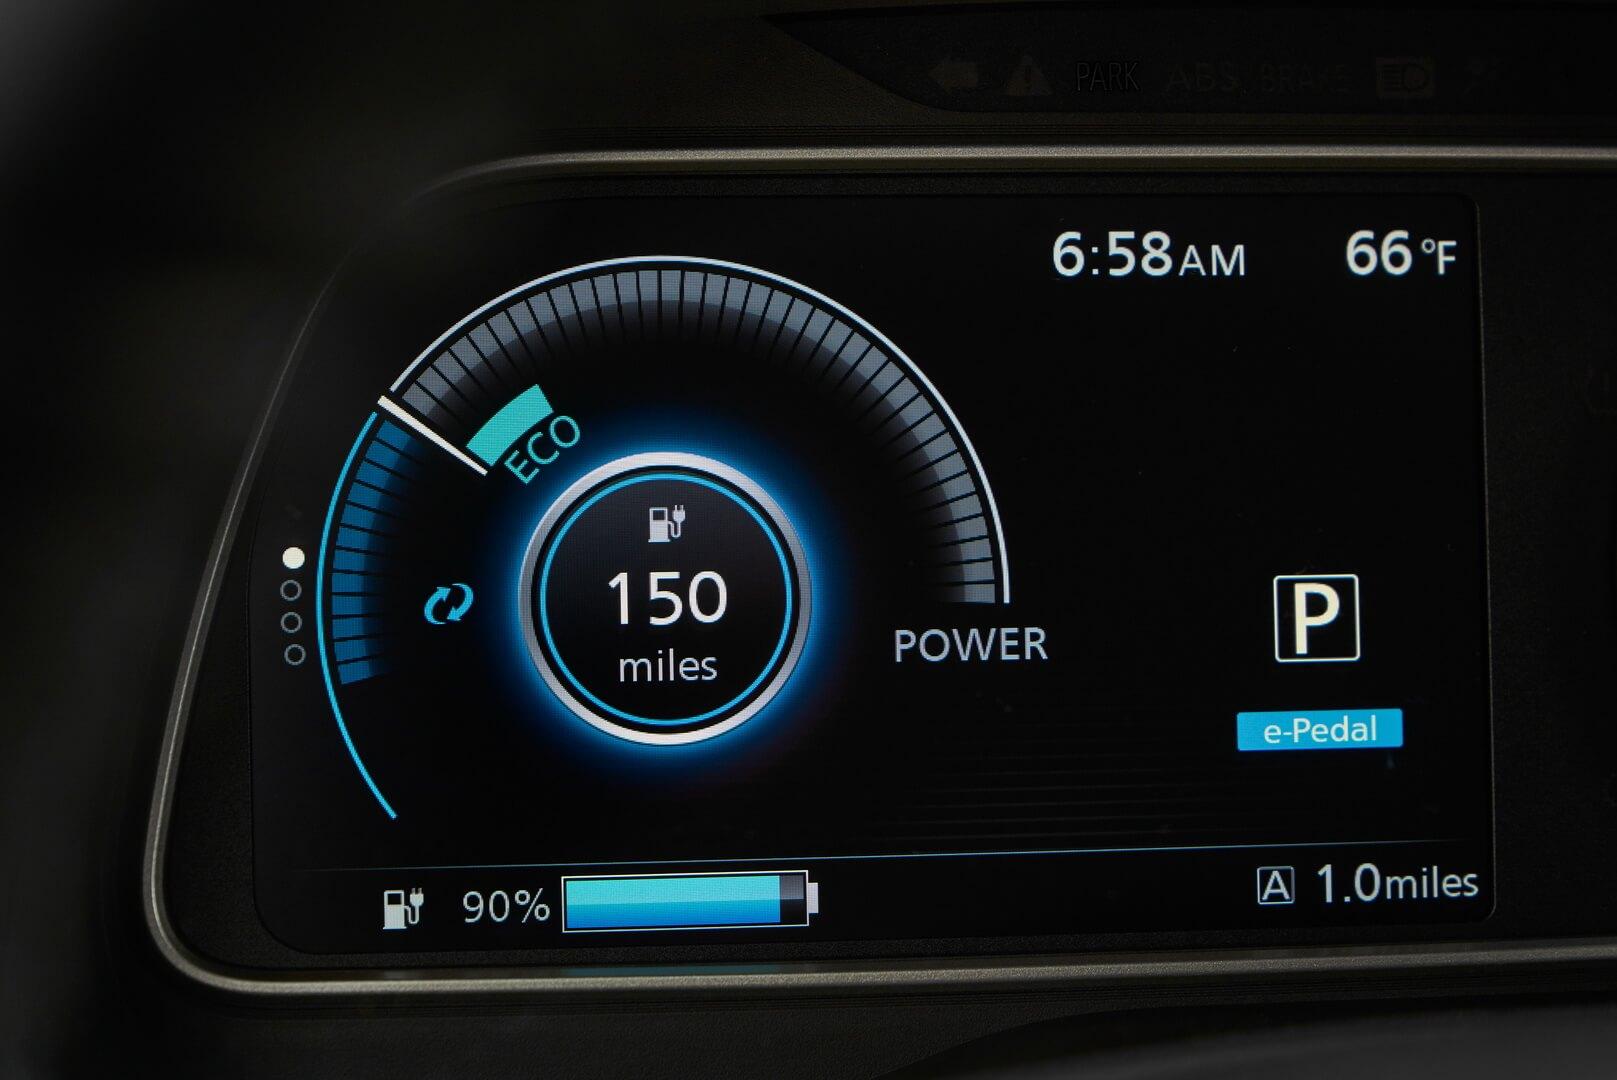 Фотография экоавто Nissan Leaf 2018 (60 кВт•ч) - фото 50